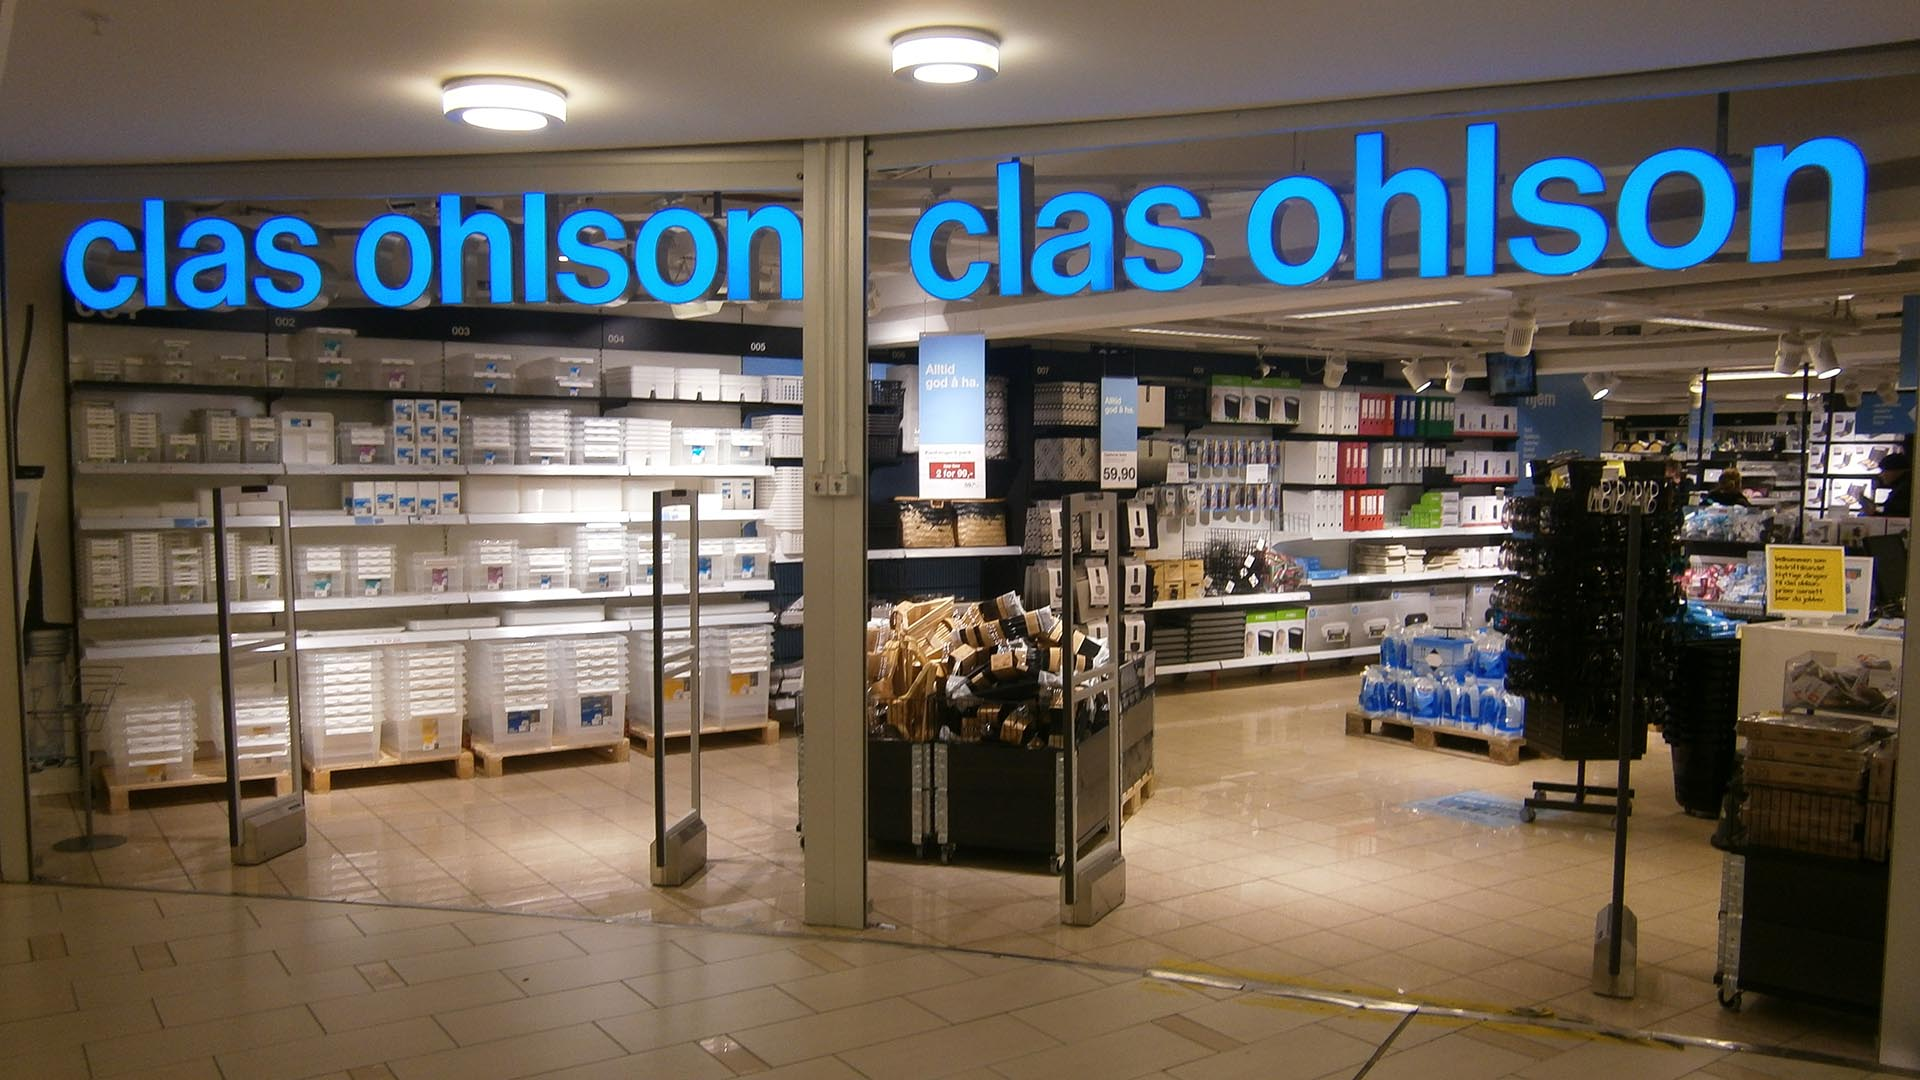 Clas Ohlson, Storo Storsenter